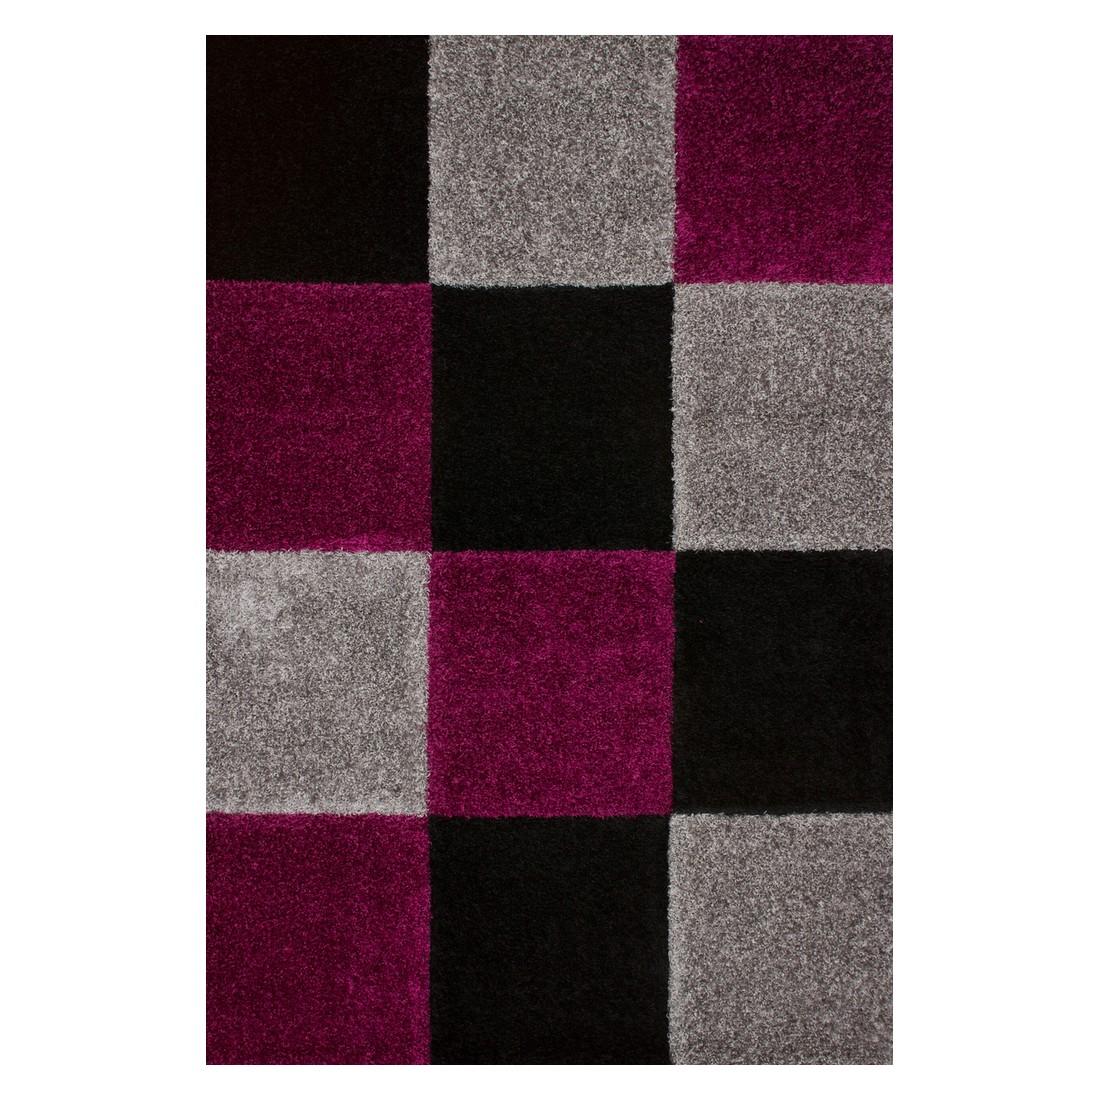 Teppich Magma I – 120 x 170 cm, Obsession jetzt kaufen